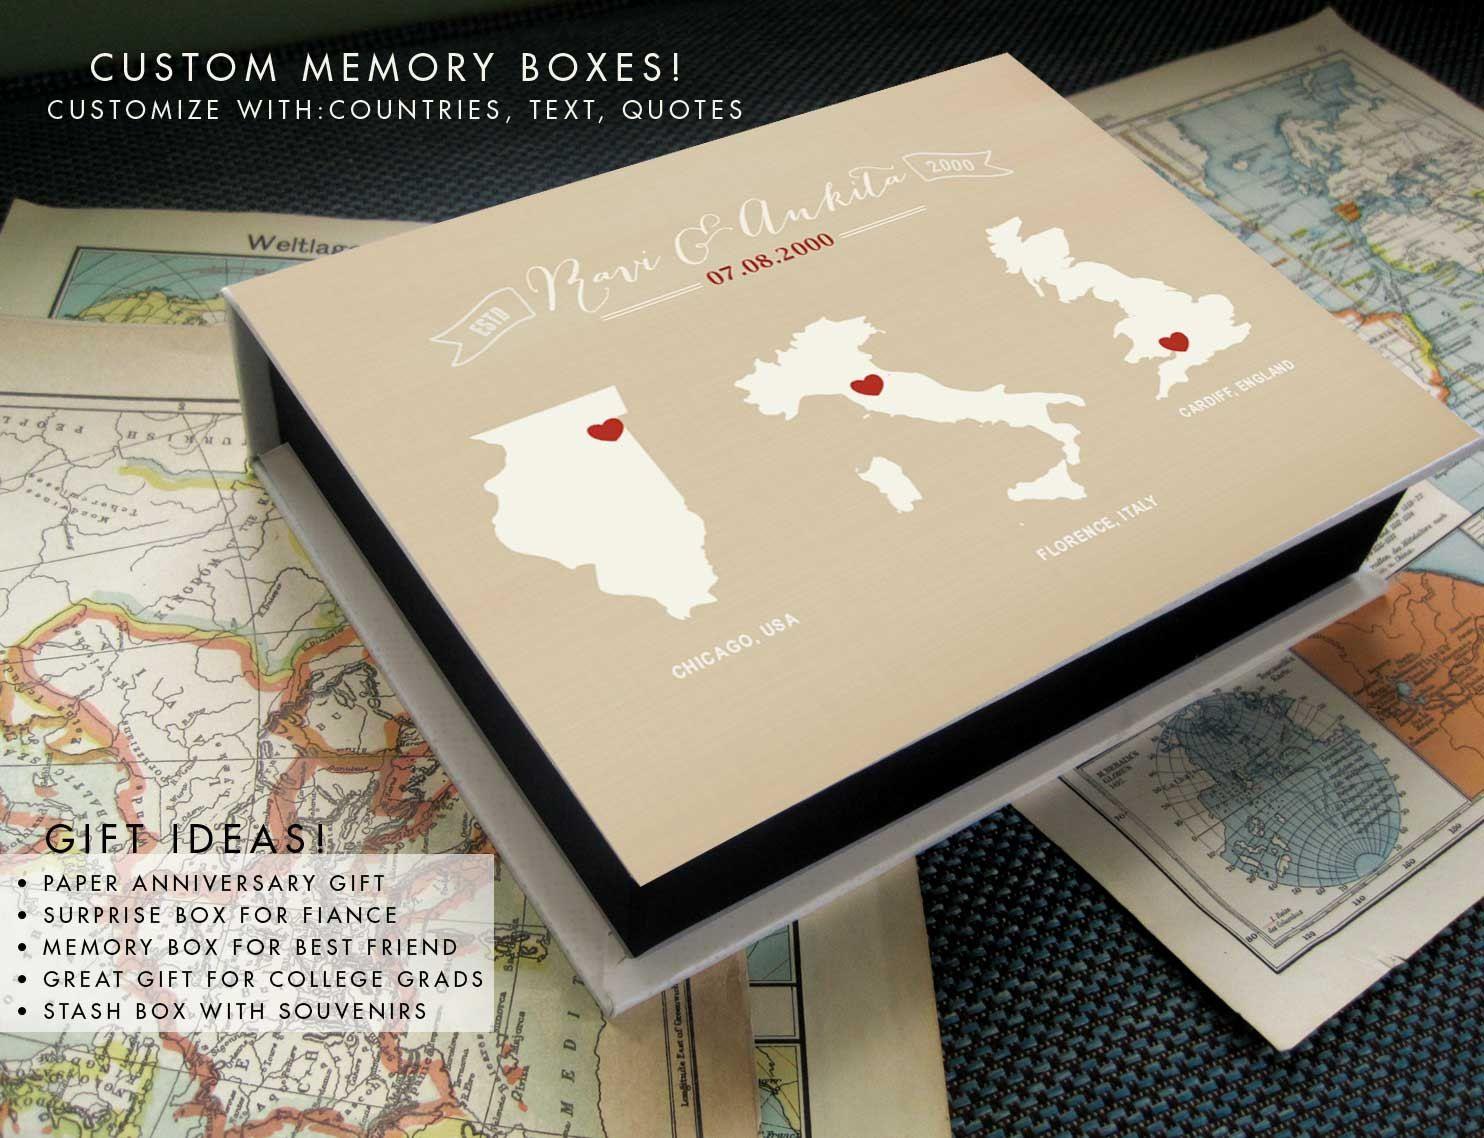 Best Wedding Gifts Under 100: Romantic Gift Ideas, Memory Box, Paper Anniversary, Under